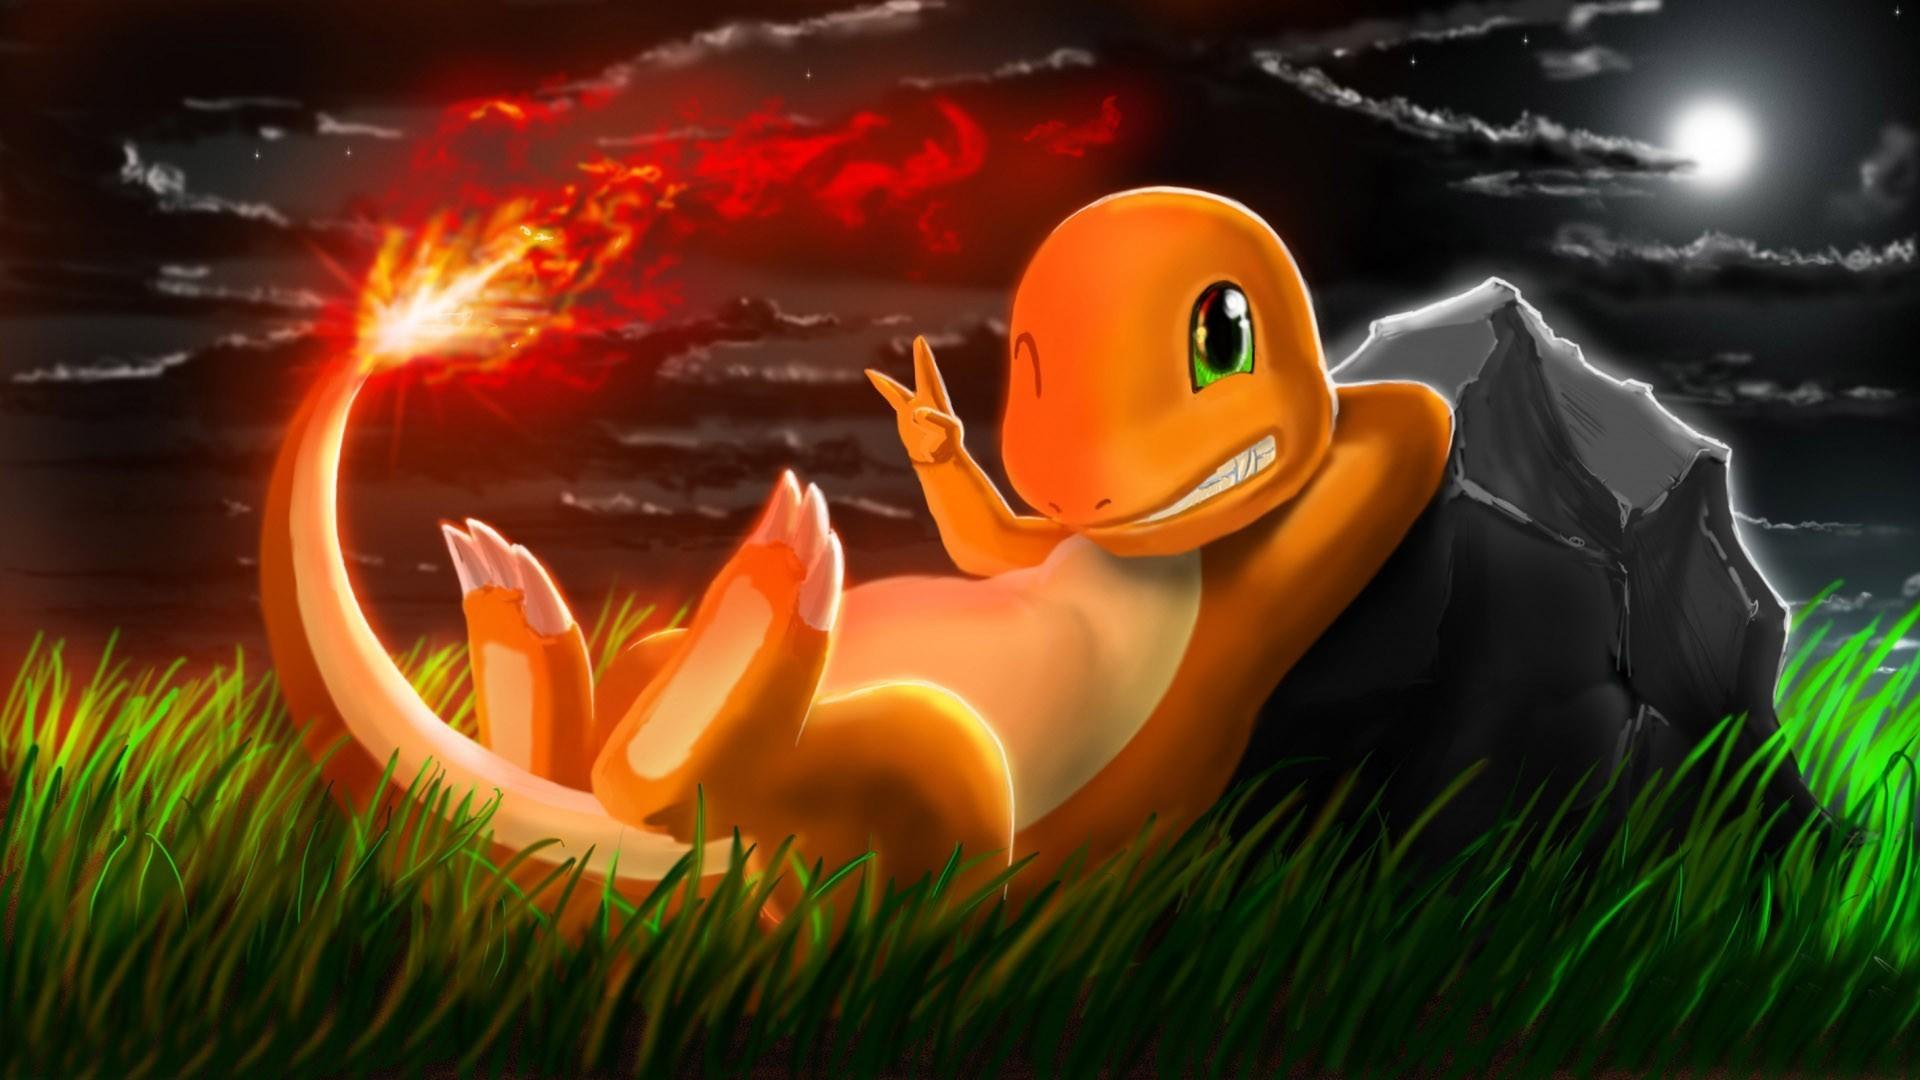 1920x1080 Charmander Pokemon wallpaper 878092